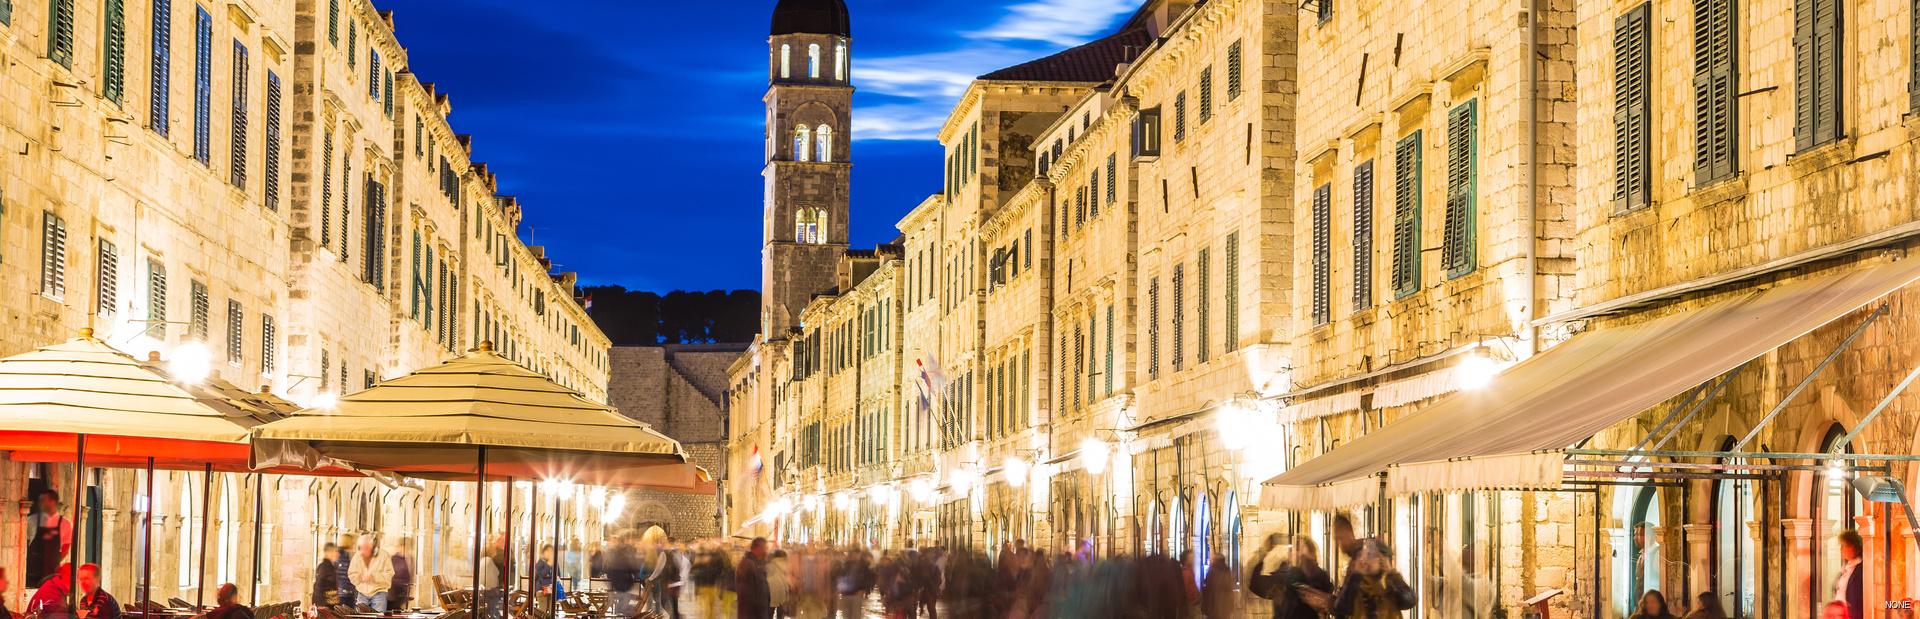 Dubrovnik news photo